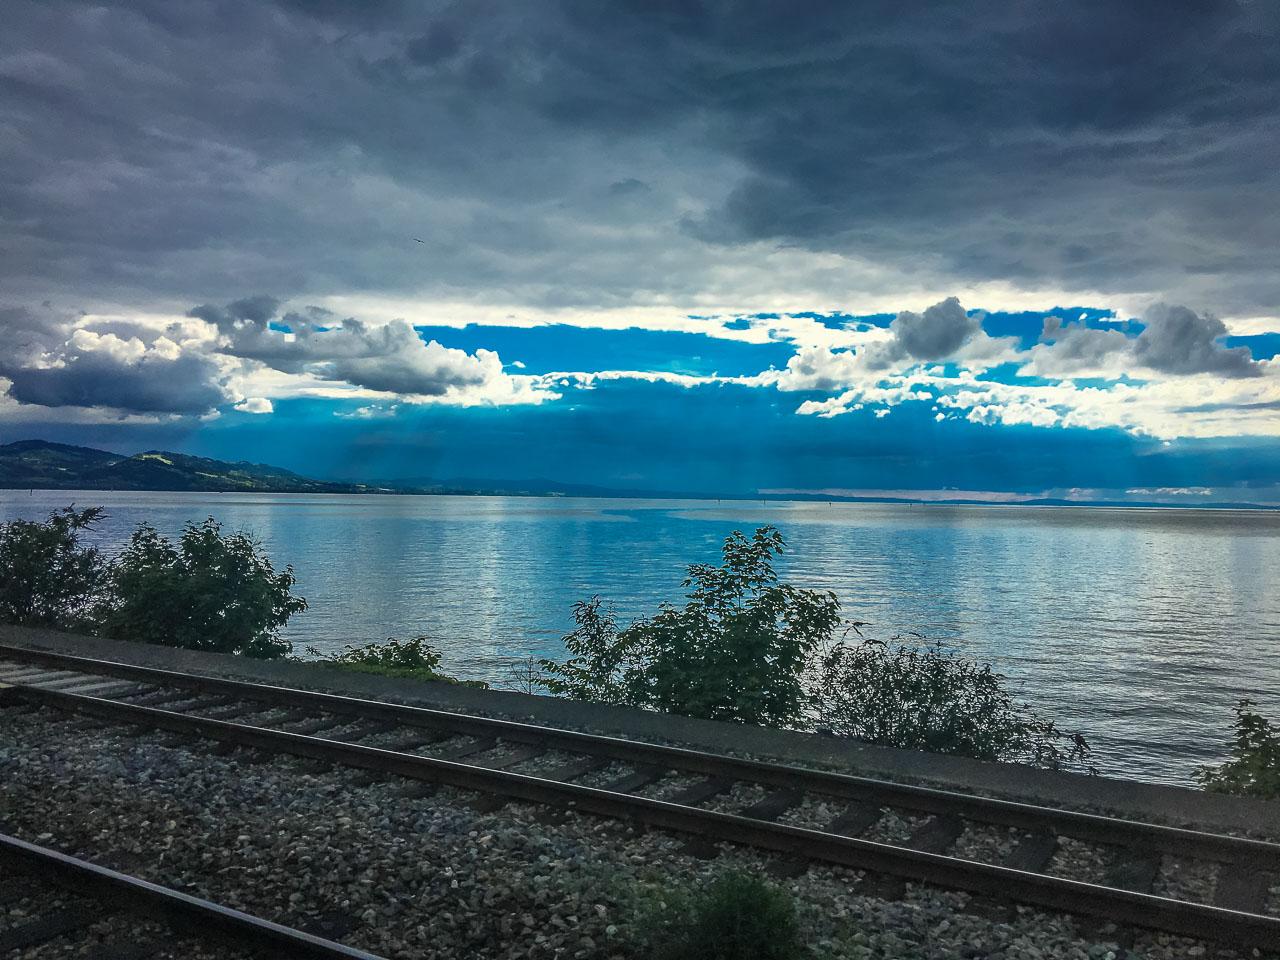 Bahn Lindau Bodensee